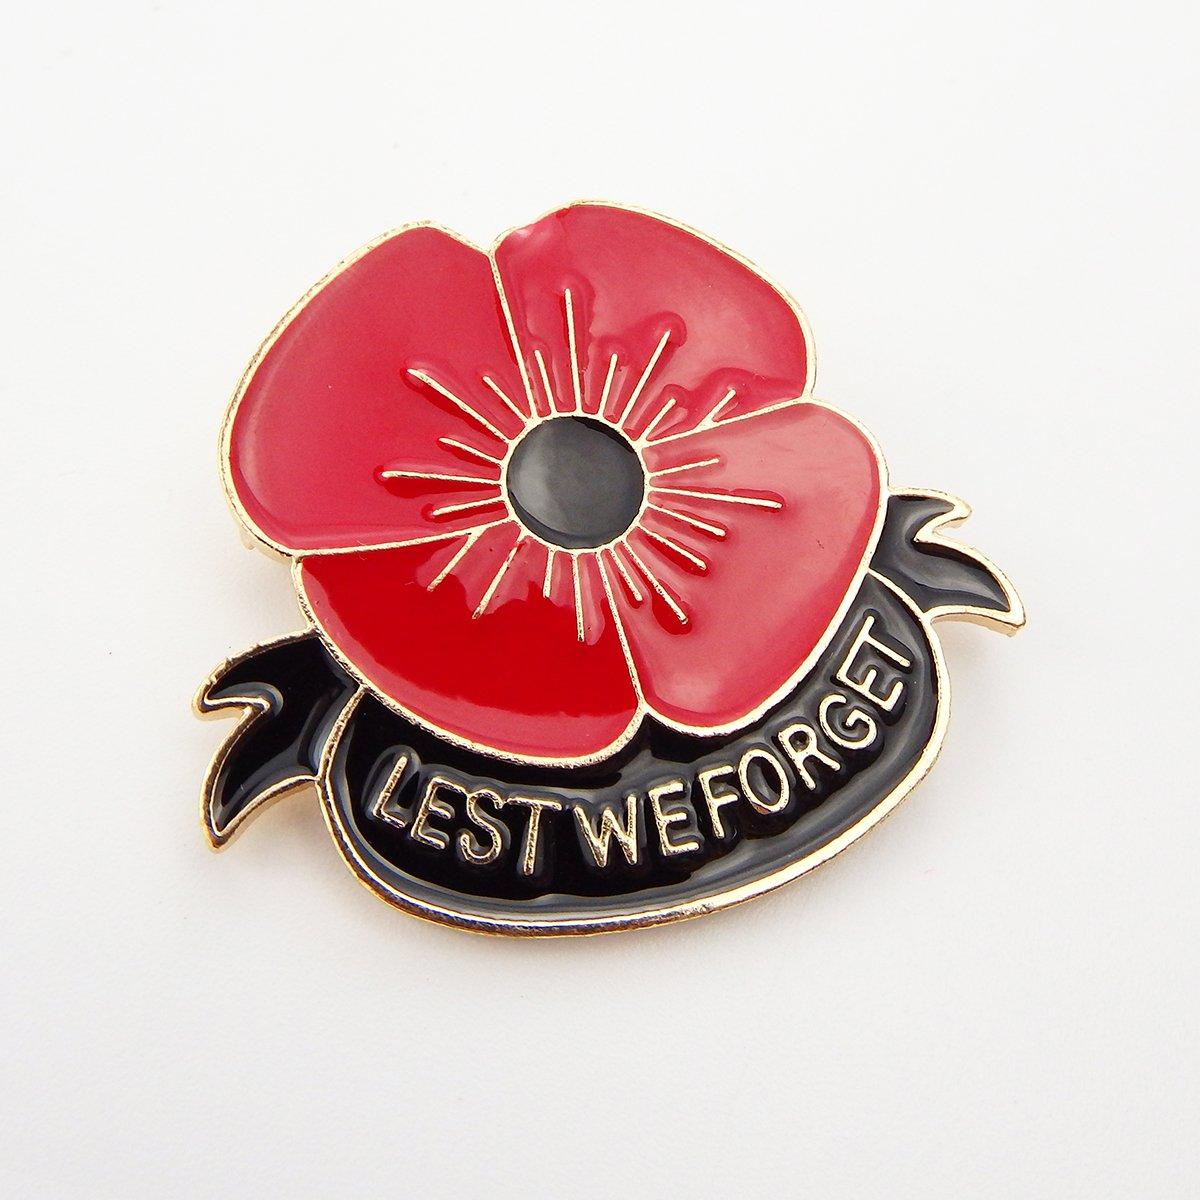 3 PCS Enamel Poppy Pin Badge Remembrance Memorial Day Gifts